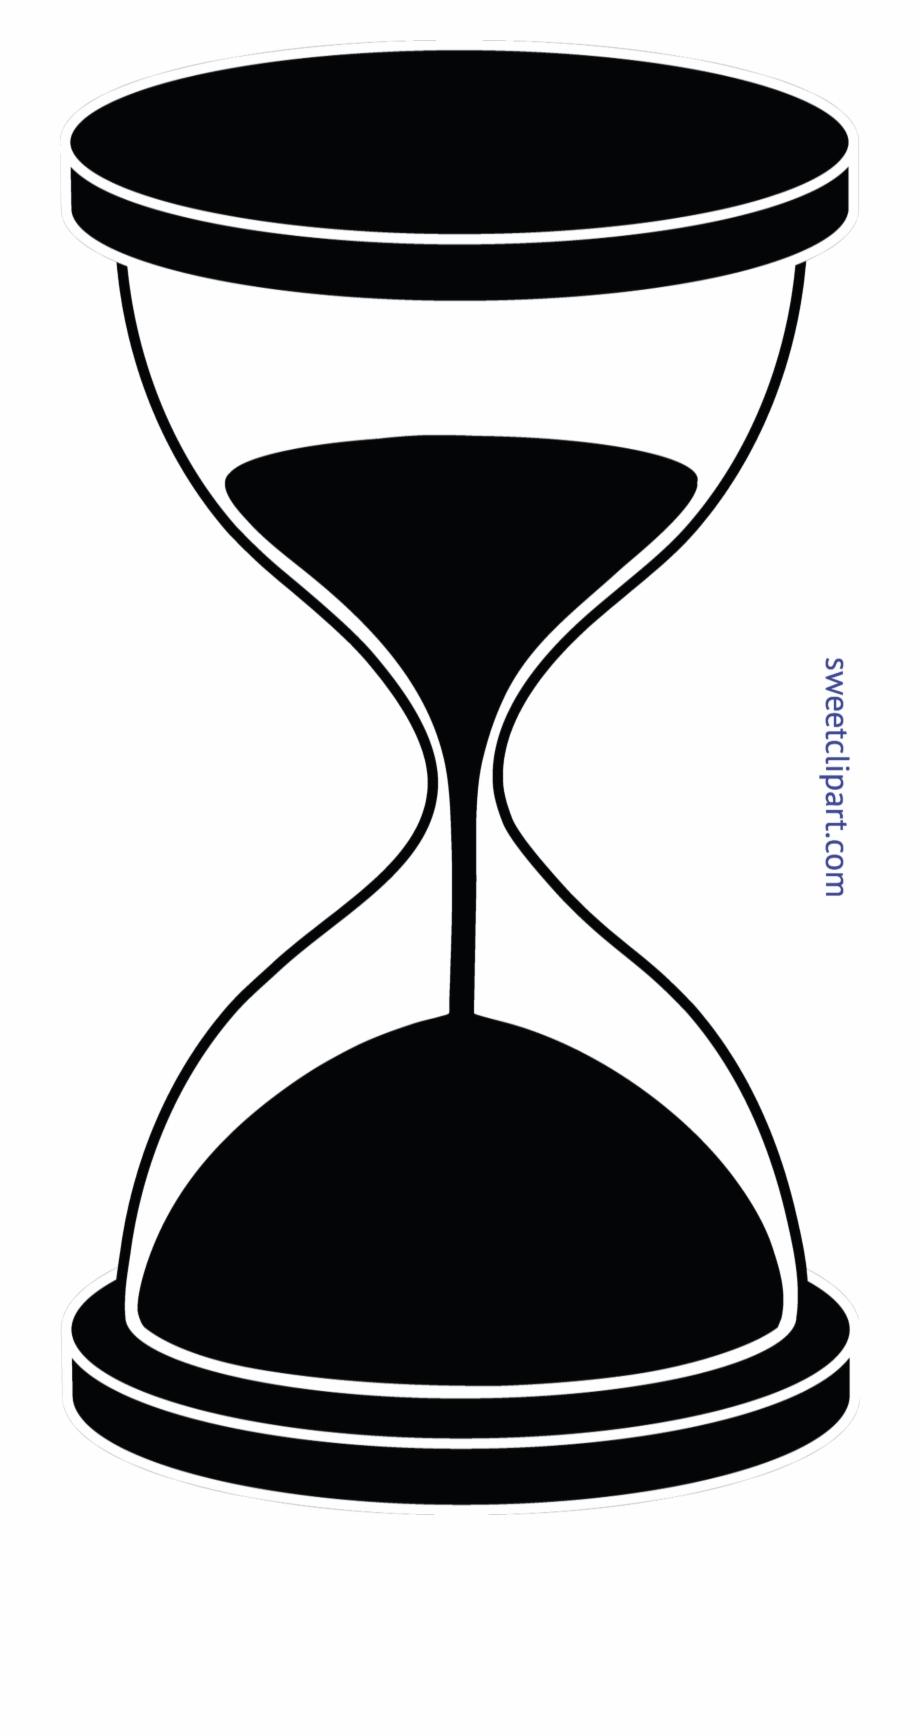 Clip art . Hourglass clipart silhouette